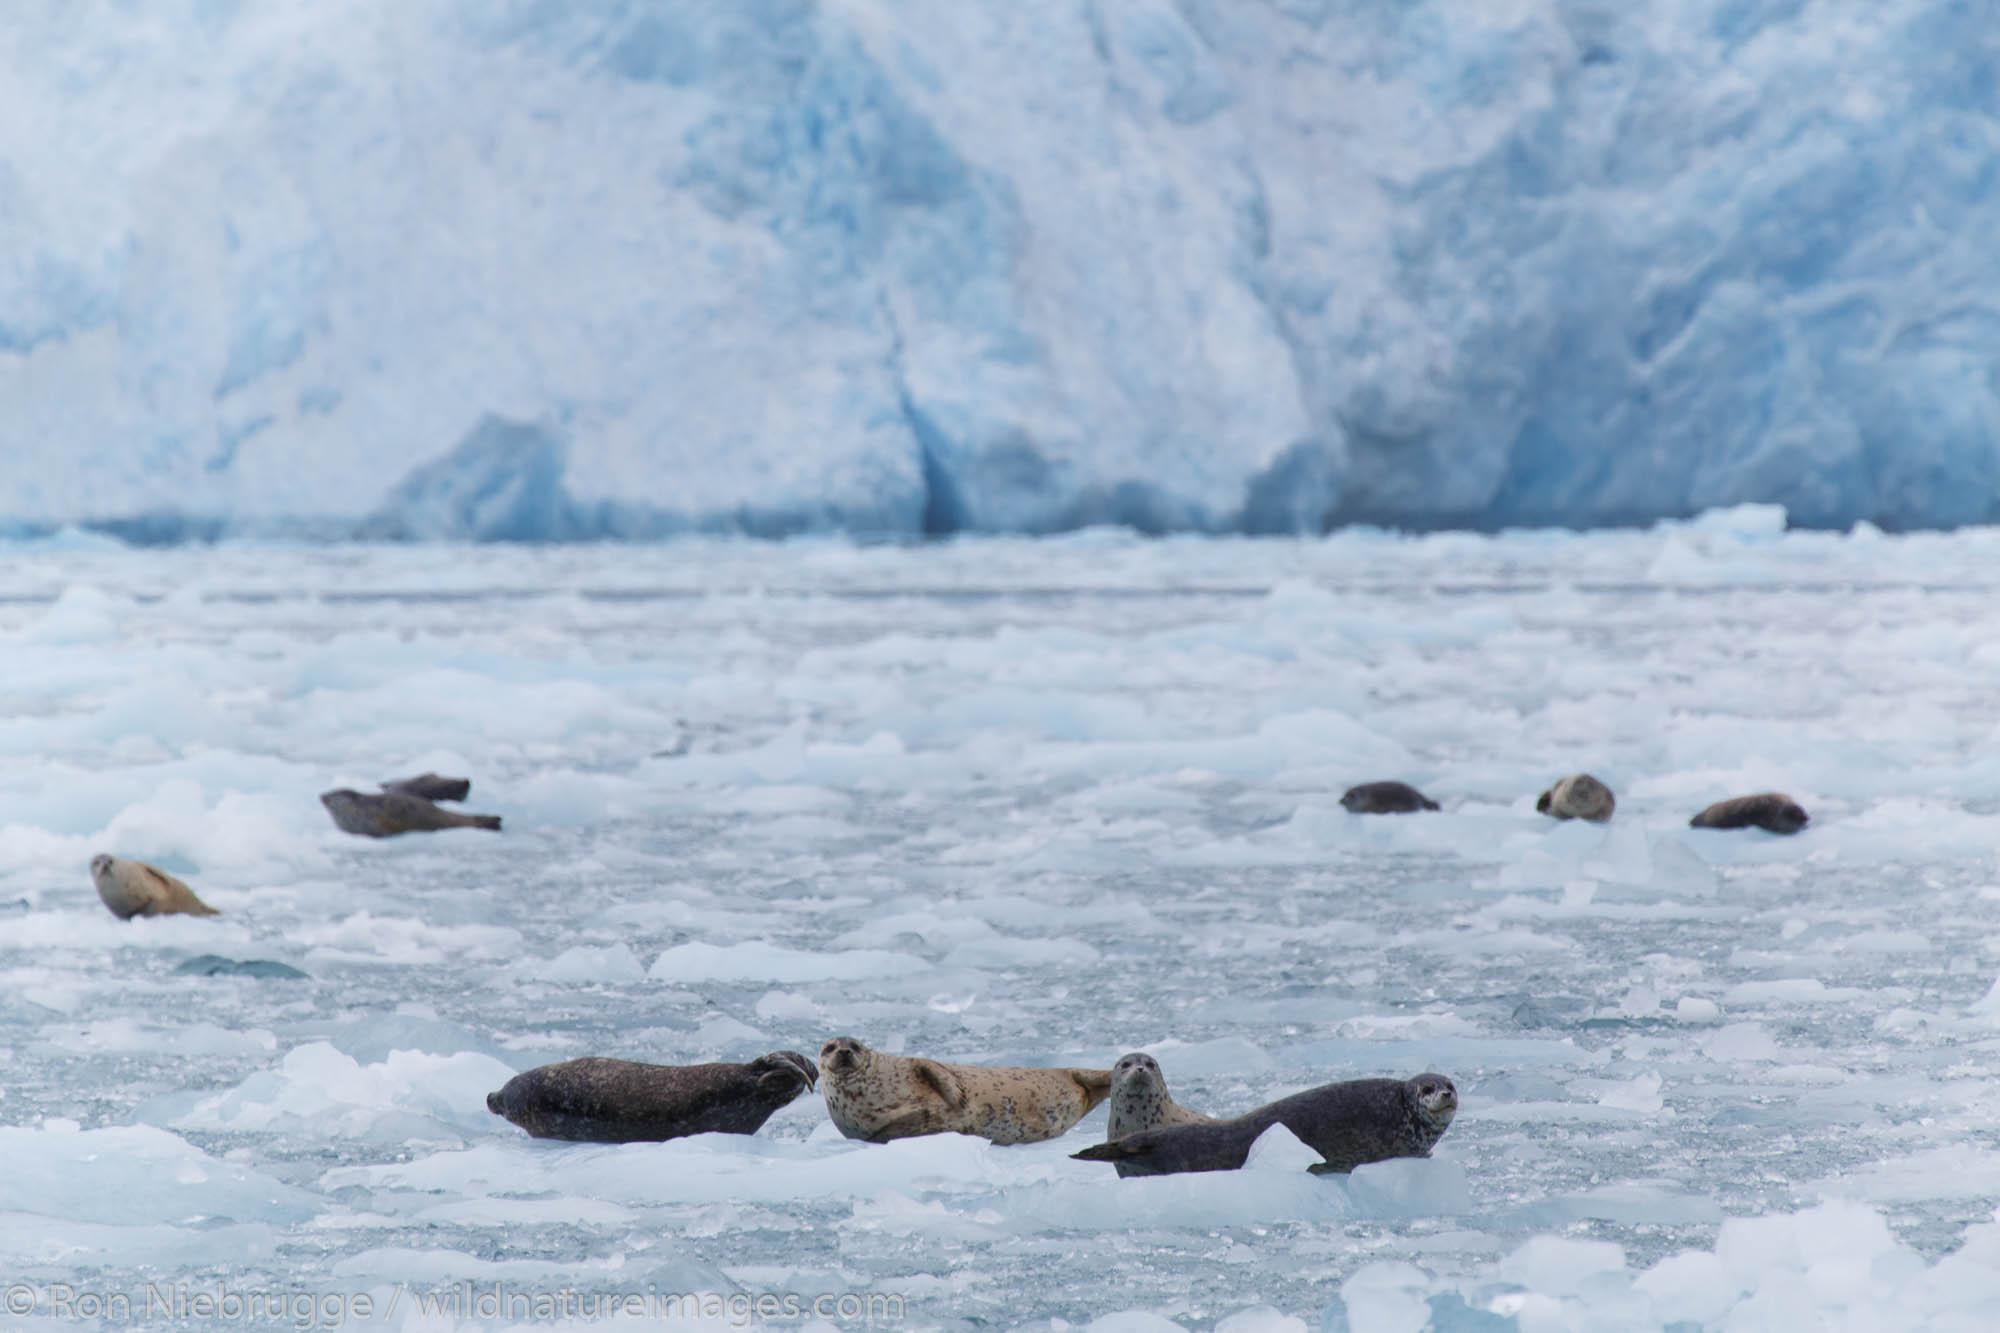 Harbor Seals (Phoca vitulina) at Chenega Glacier in Nassau Fjord, Prince William Sound, Chugach National Forest, Alaska.